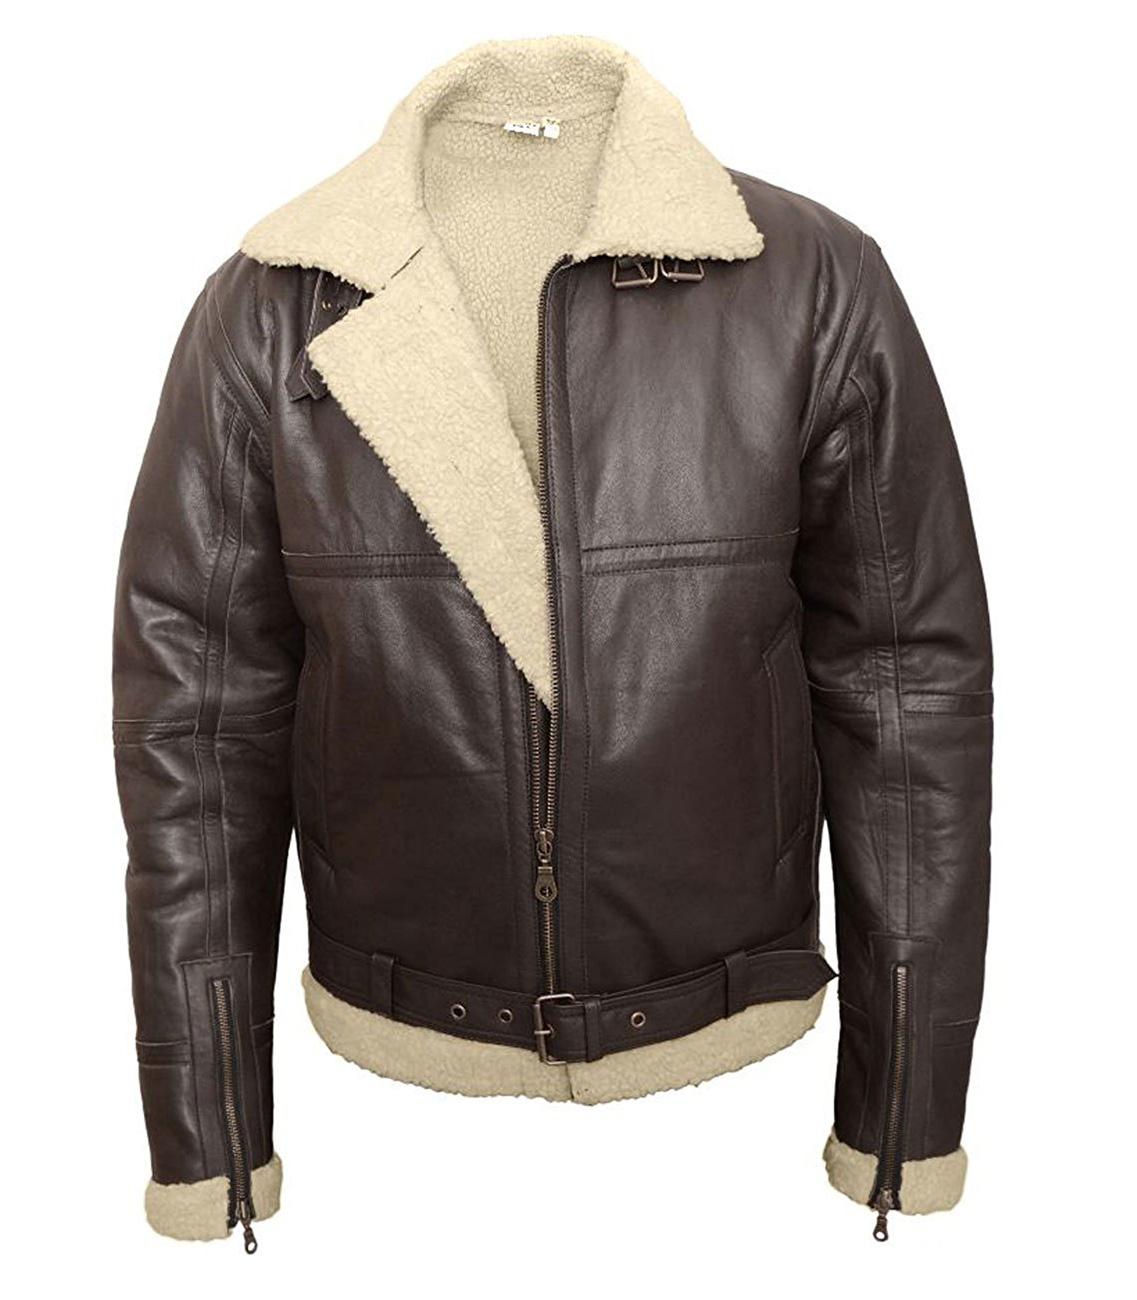 b3-bomber-jacket-e